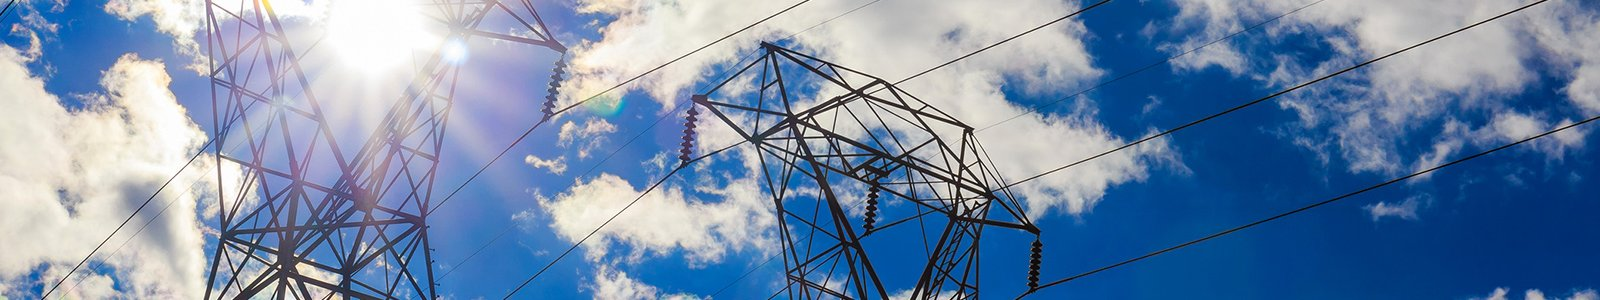 Overhead power lines (iStock/photovs )